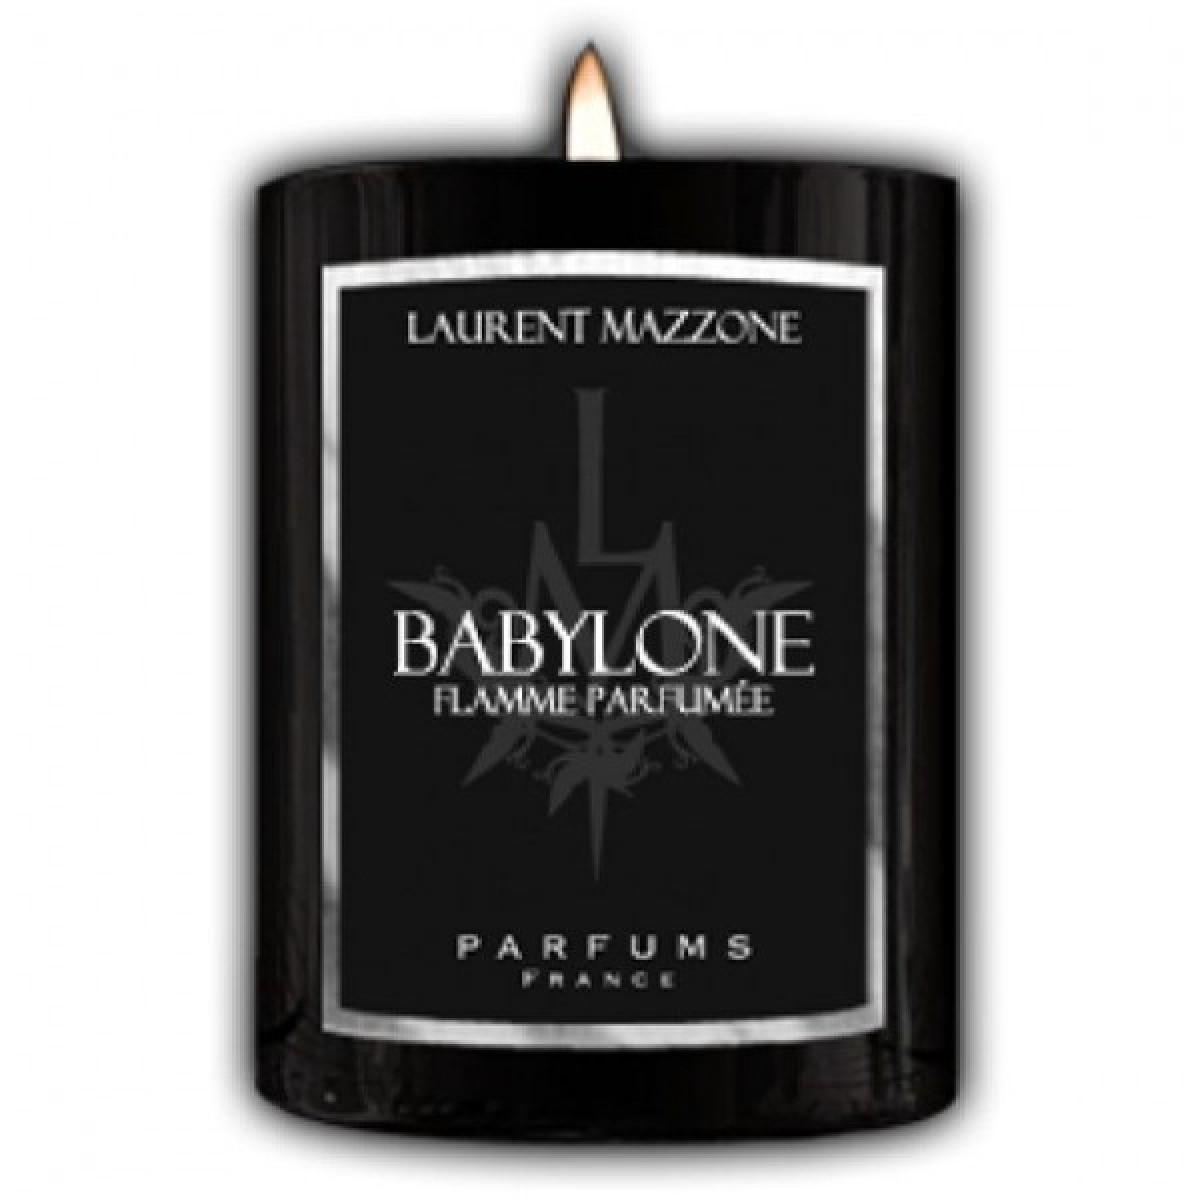 BABYLONE - LM Parfums